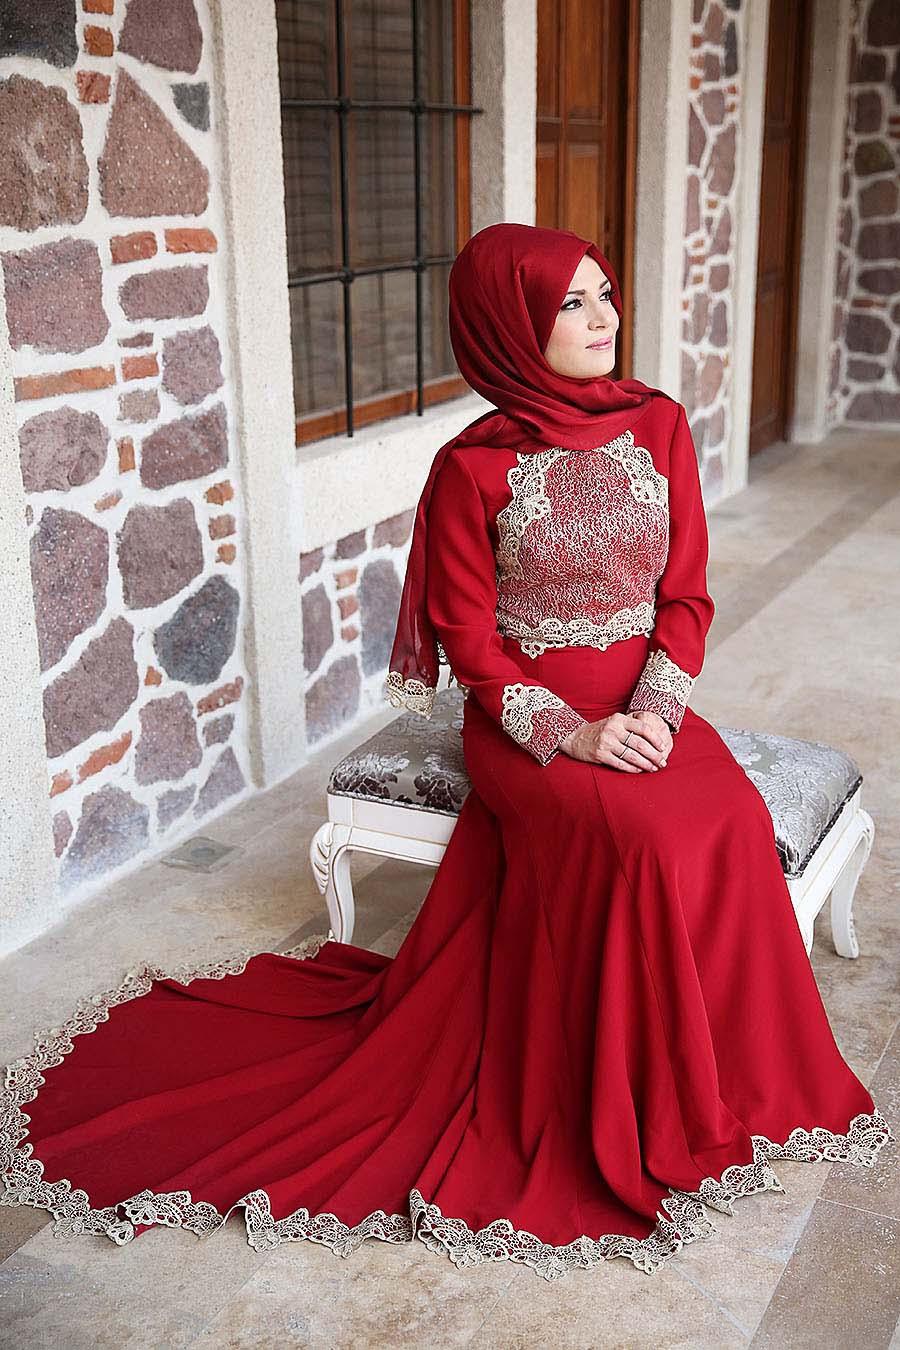 بالصور صور فساتين تركي , اجمل موديلات الفساتين التركي 1839 12